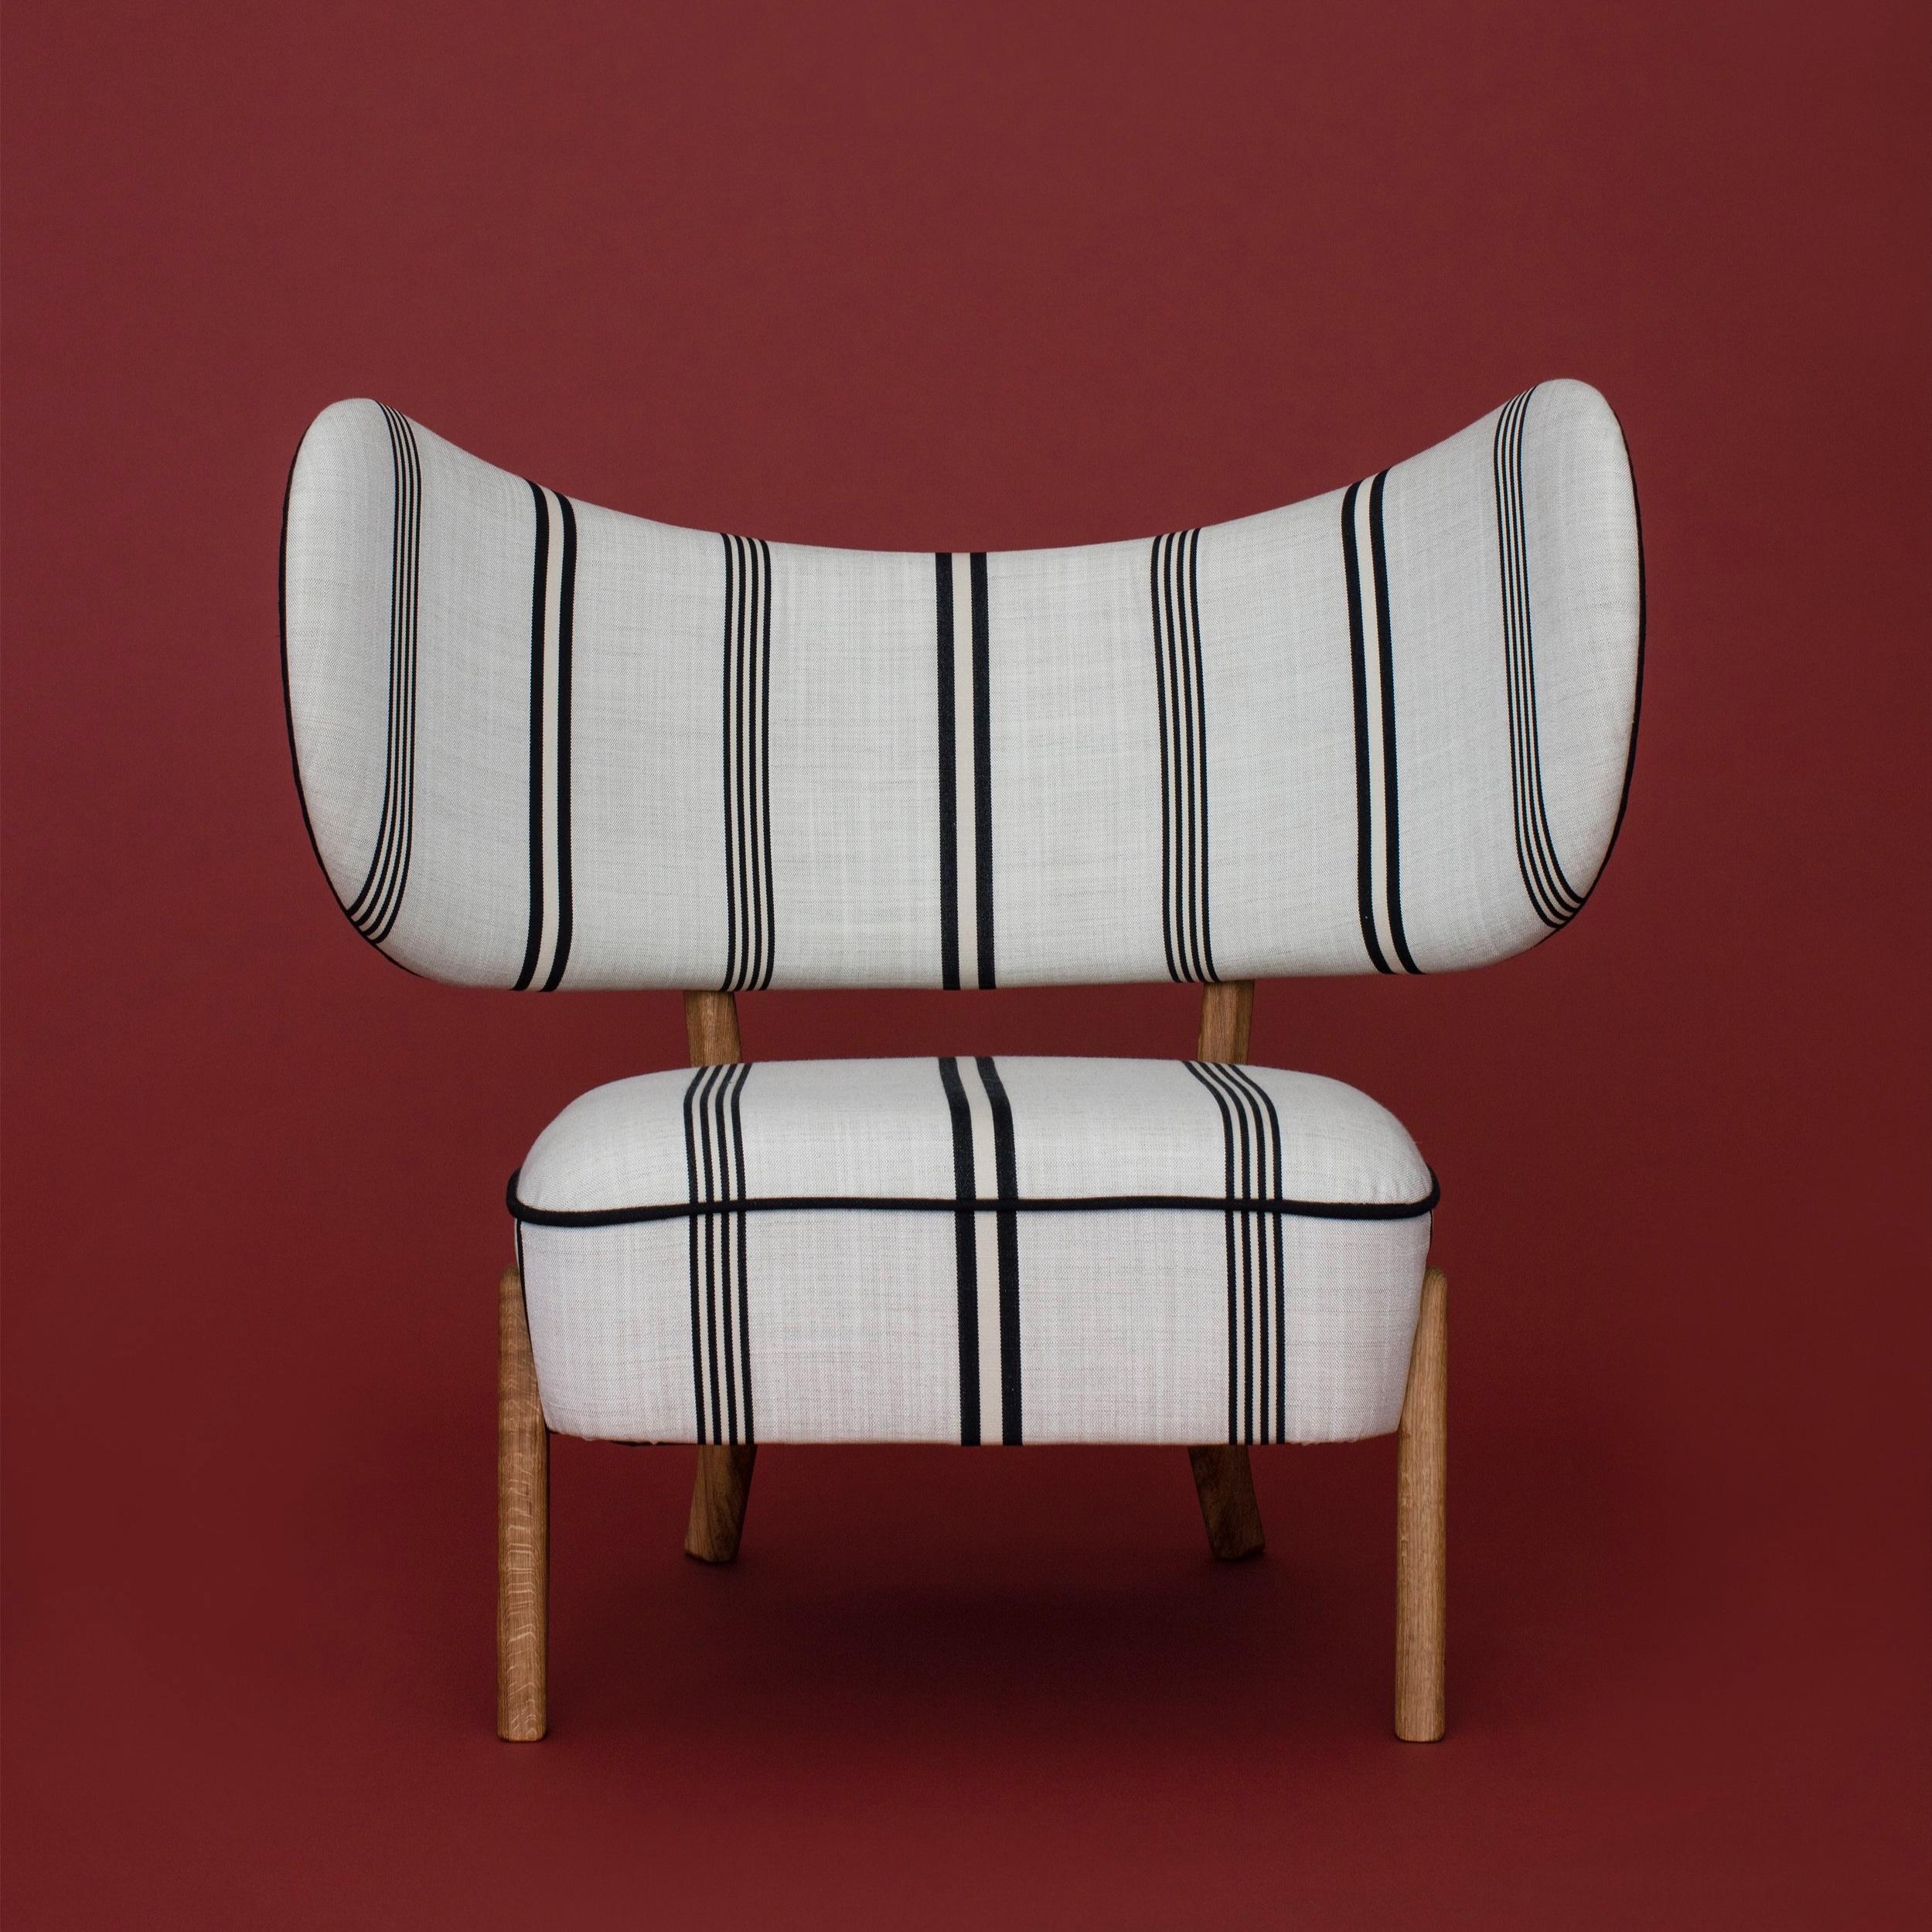 mazo_design_magnus_lassaoe_stephenson_tmbo_lounge_chair_gestalt_new_york.jpg